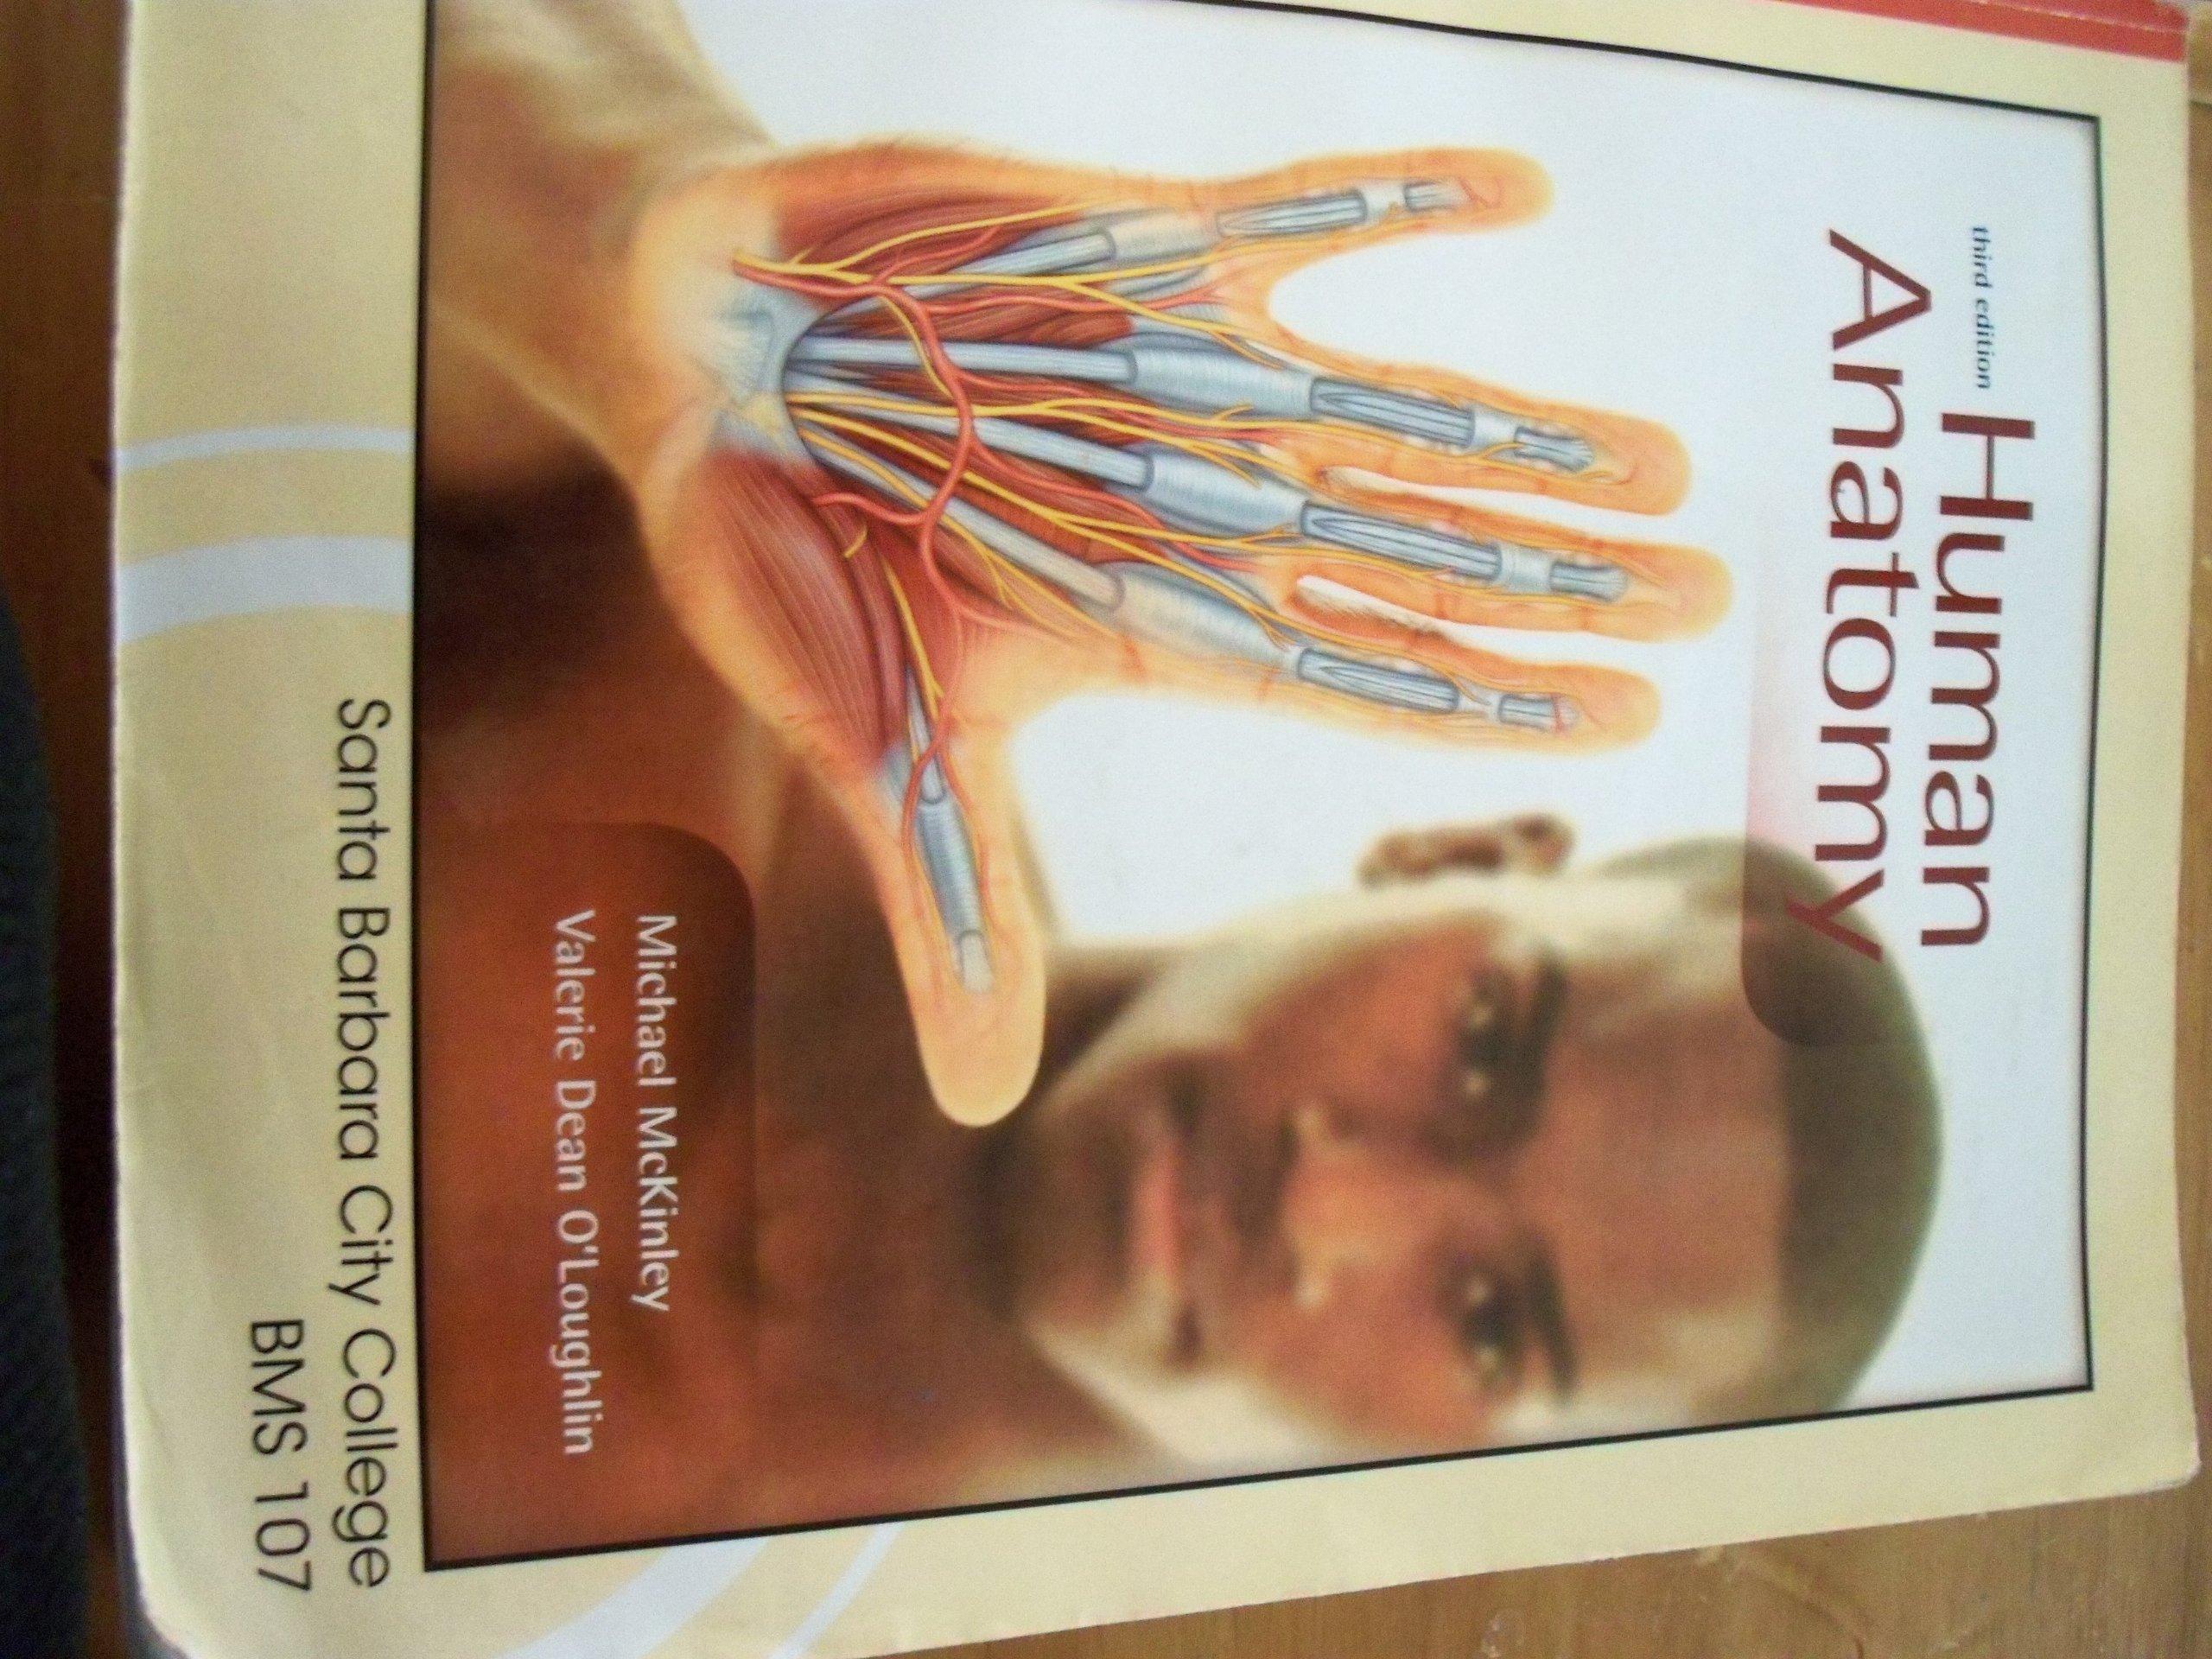 Human Anatomy 3rd Edition Santa Barbara City College Bms 107